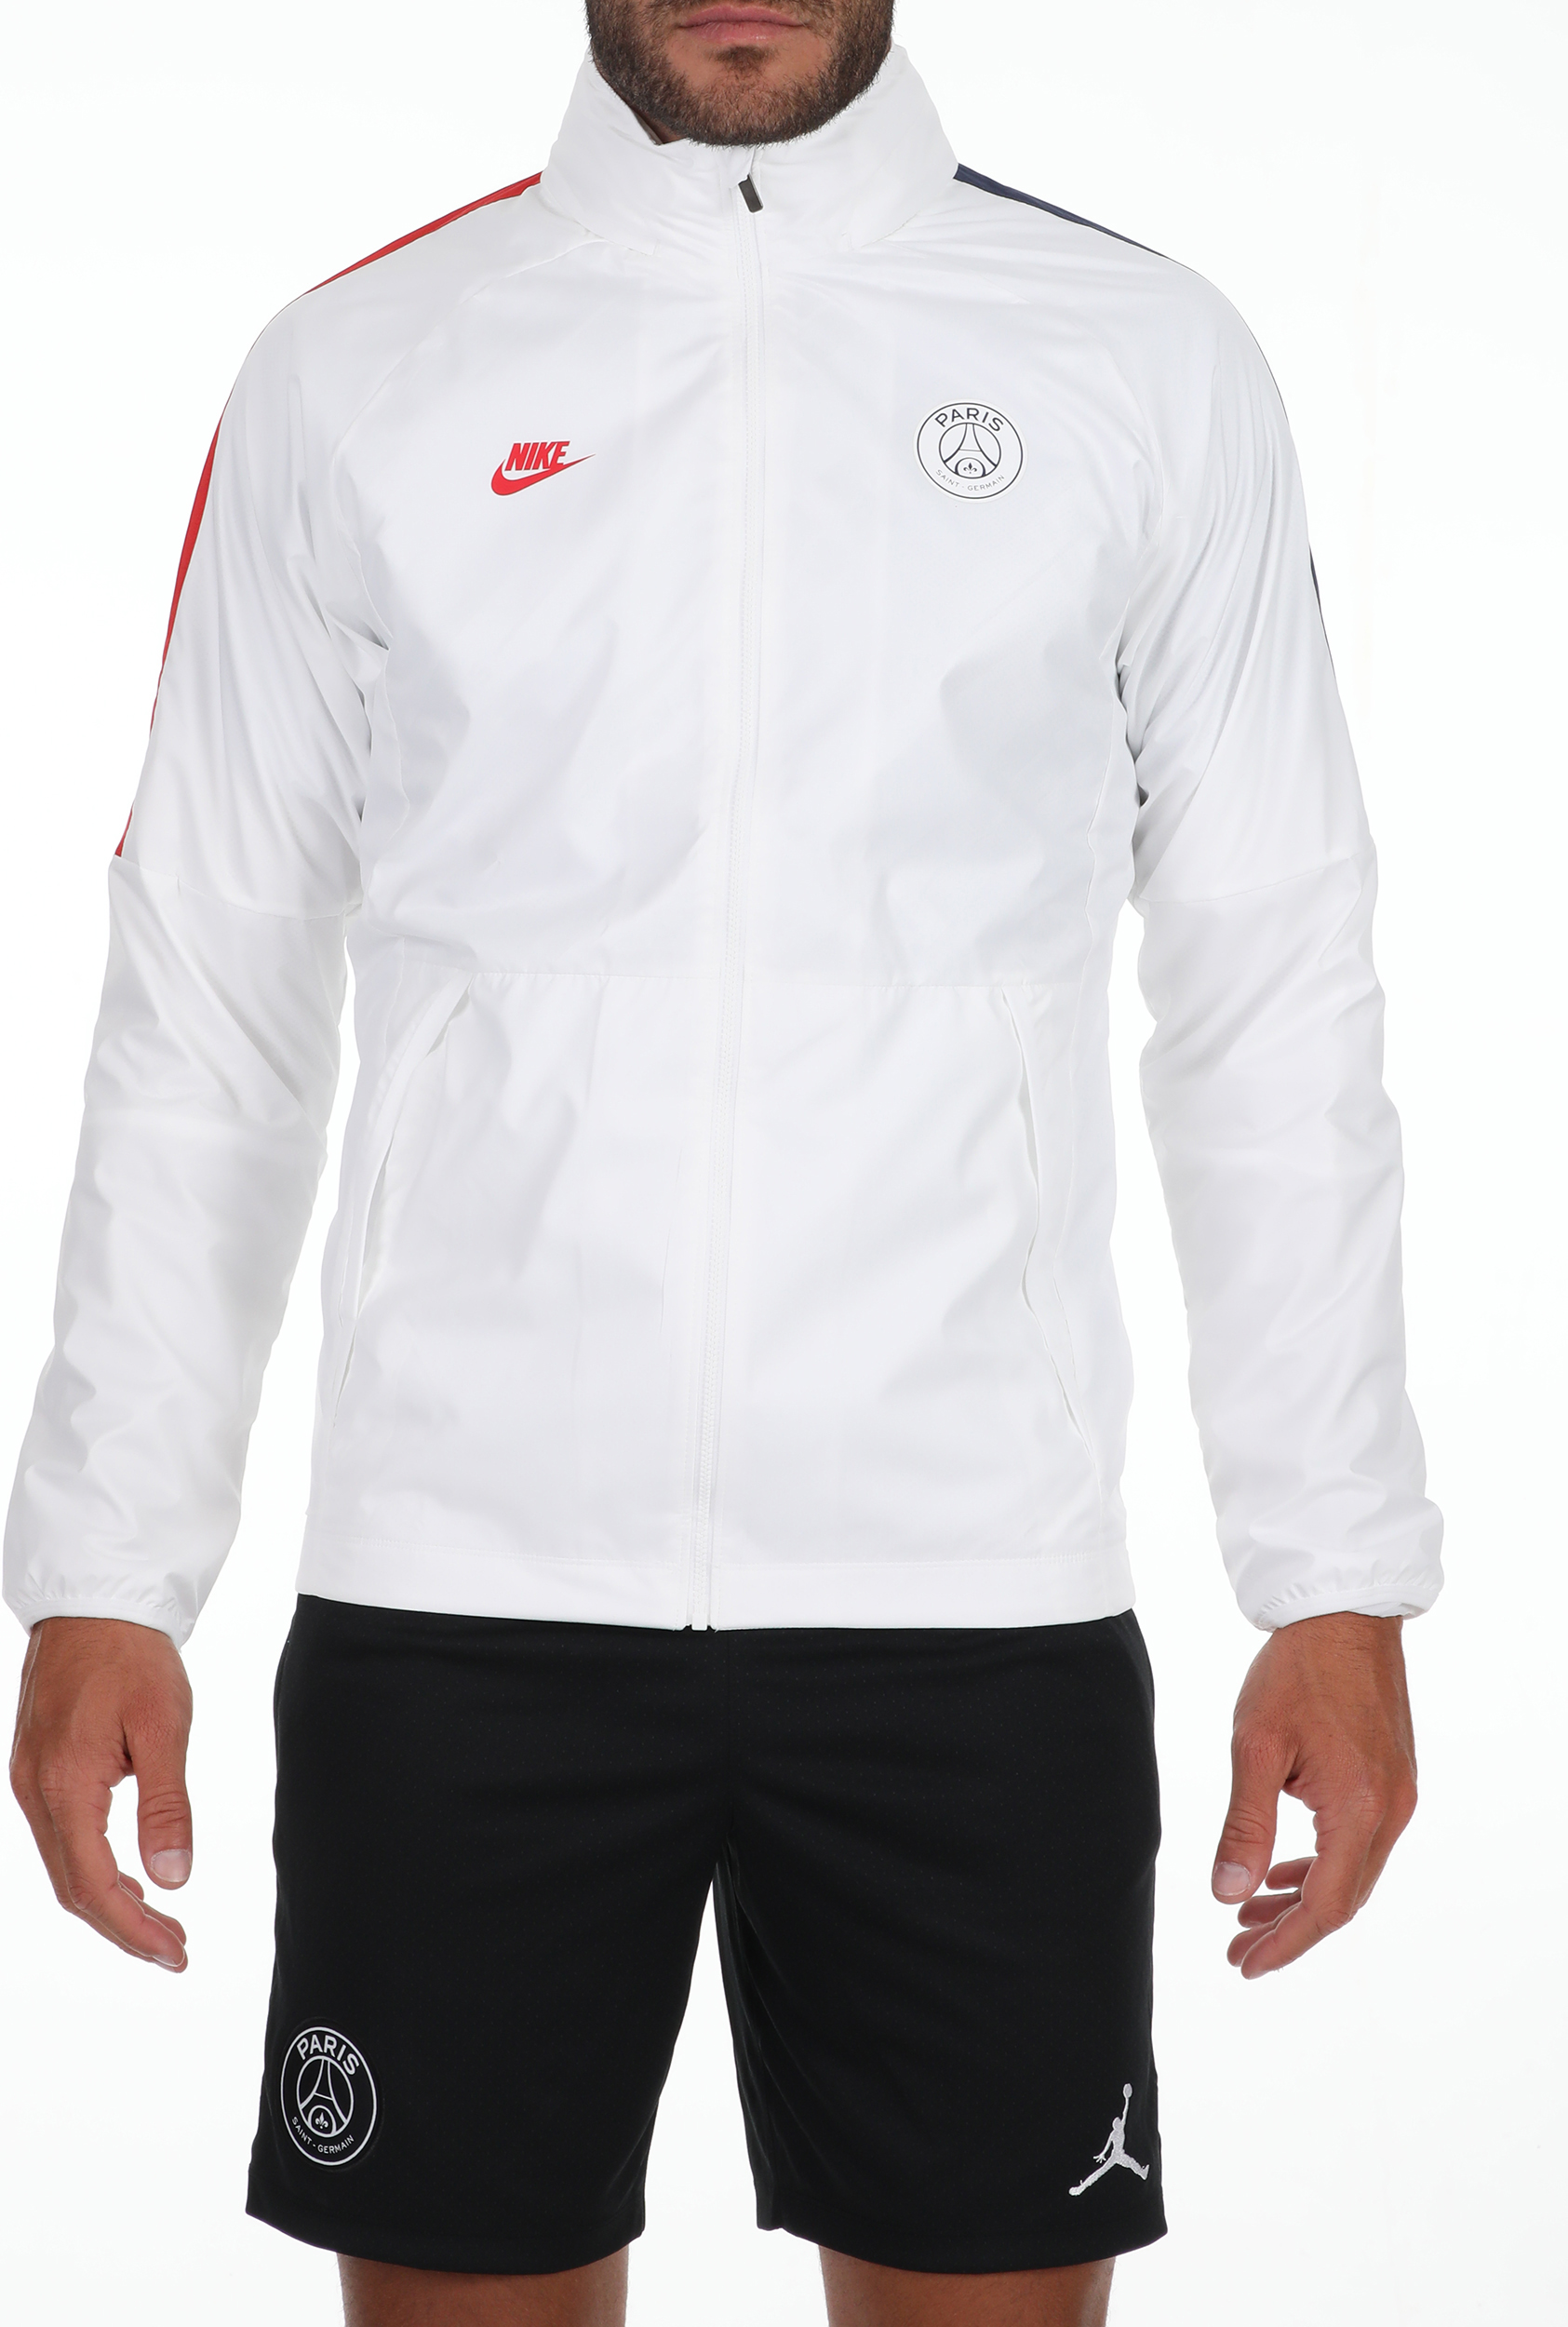 NIKE - Ανδρικό αθλητικό jacket NIKE PSG M NK AWF LTE JKT CL λευκό